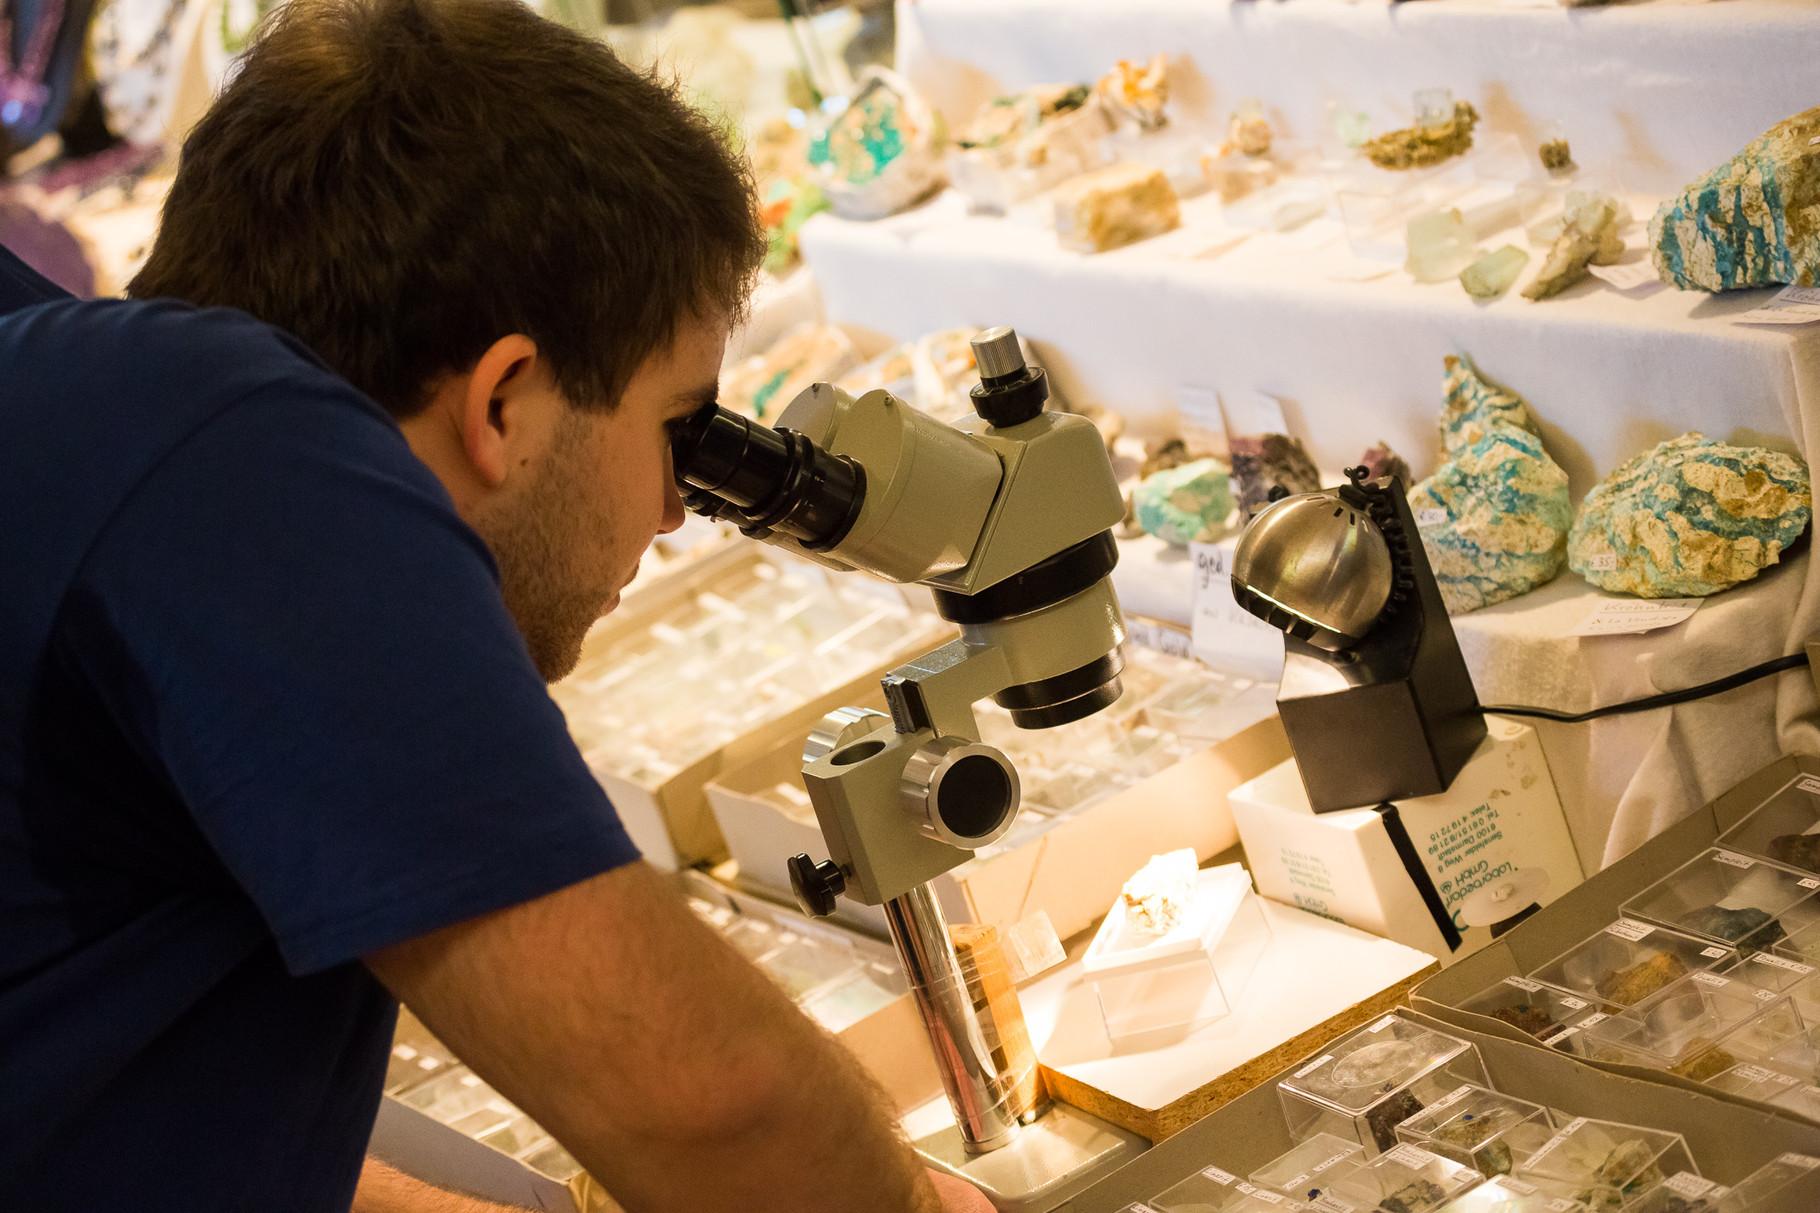 Der Veranstalter am Mikroskop